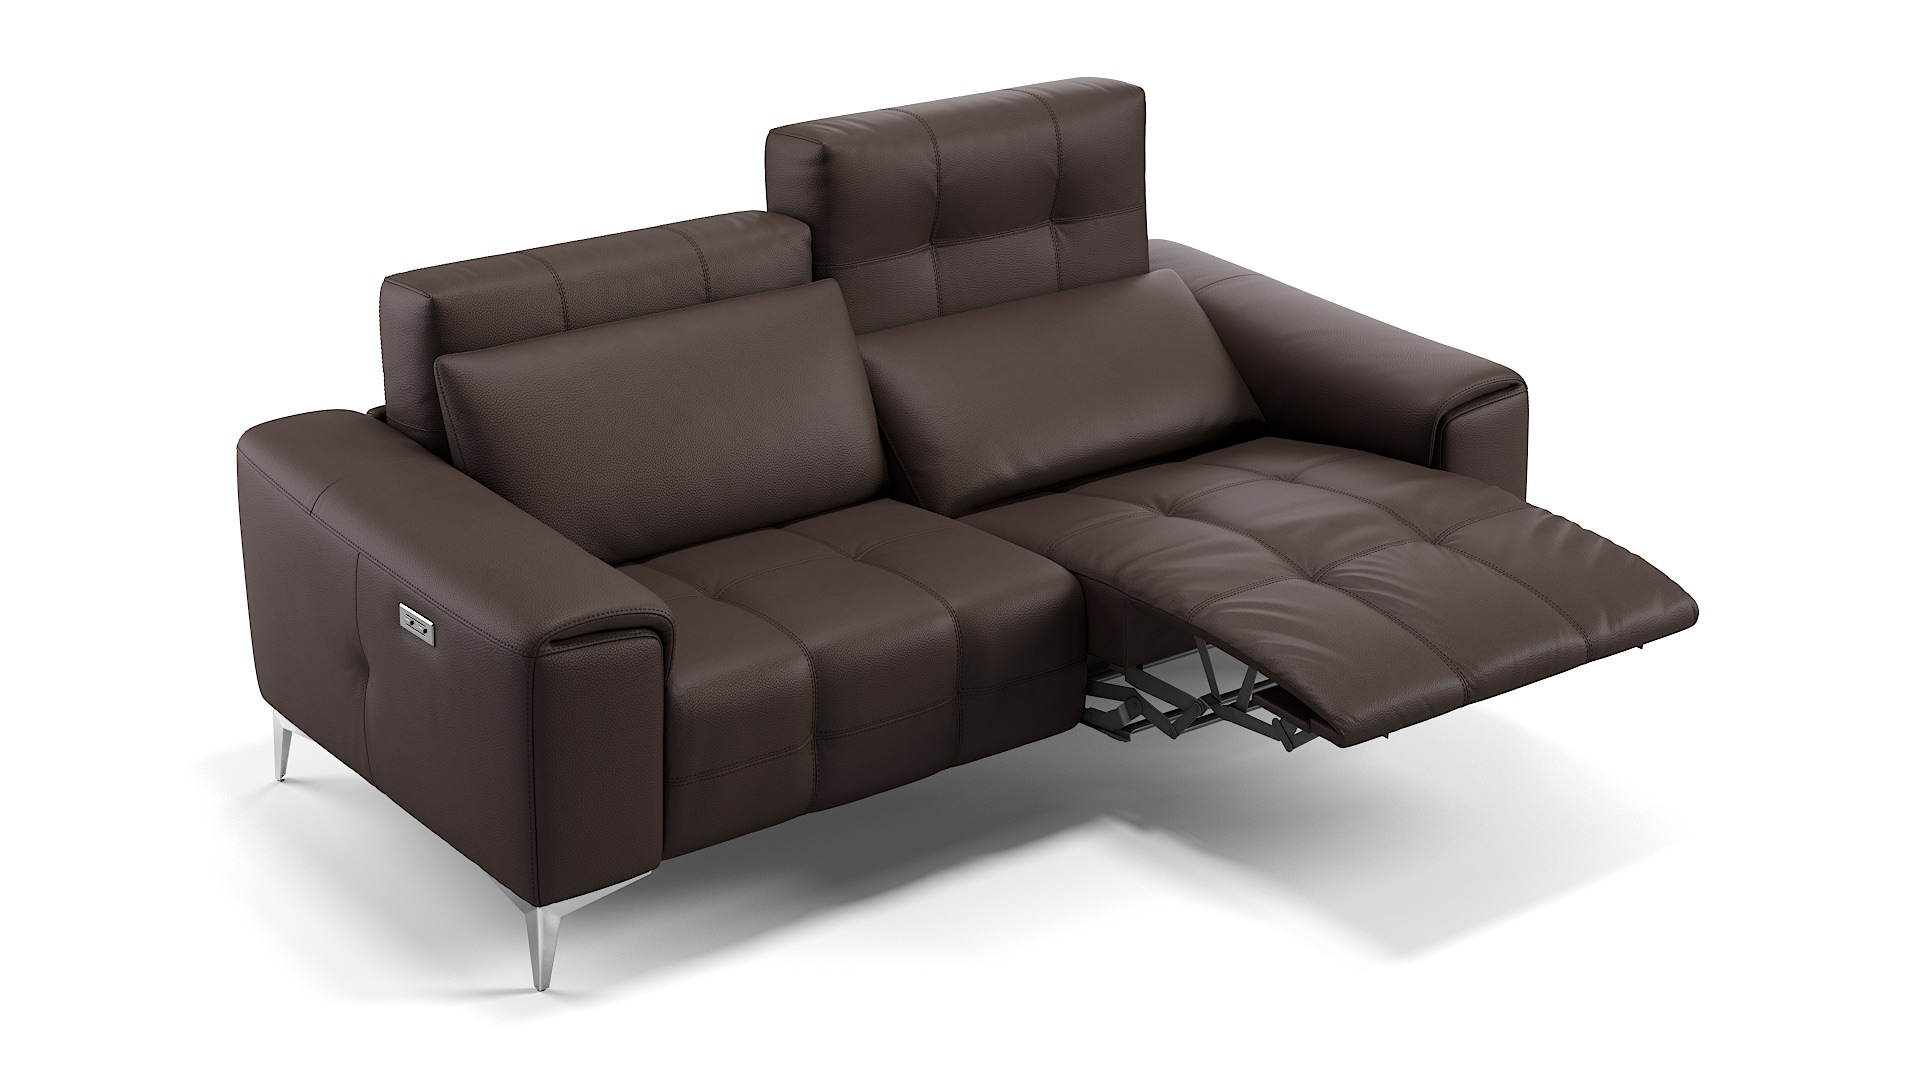 Leder 2-Sitzer Sofa SALENTO